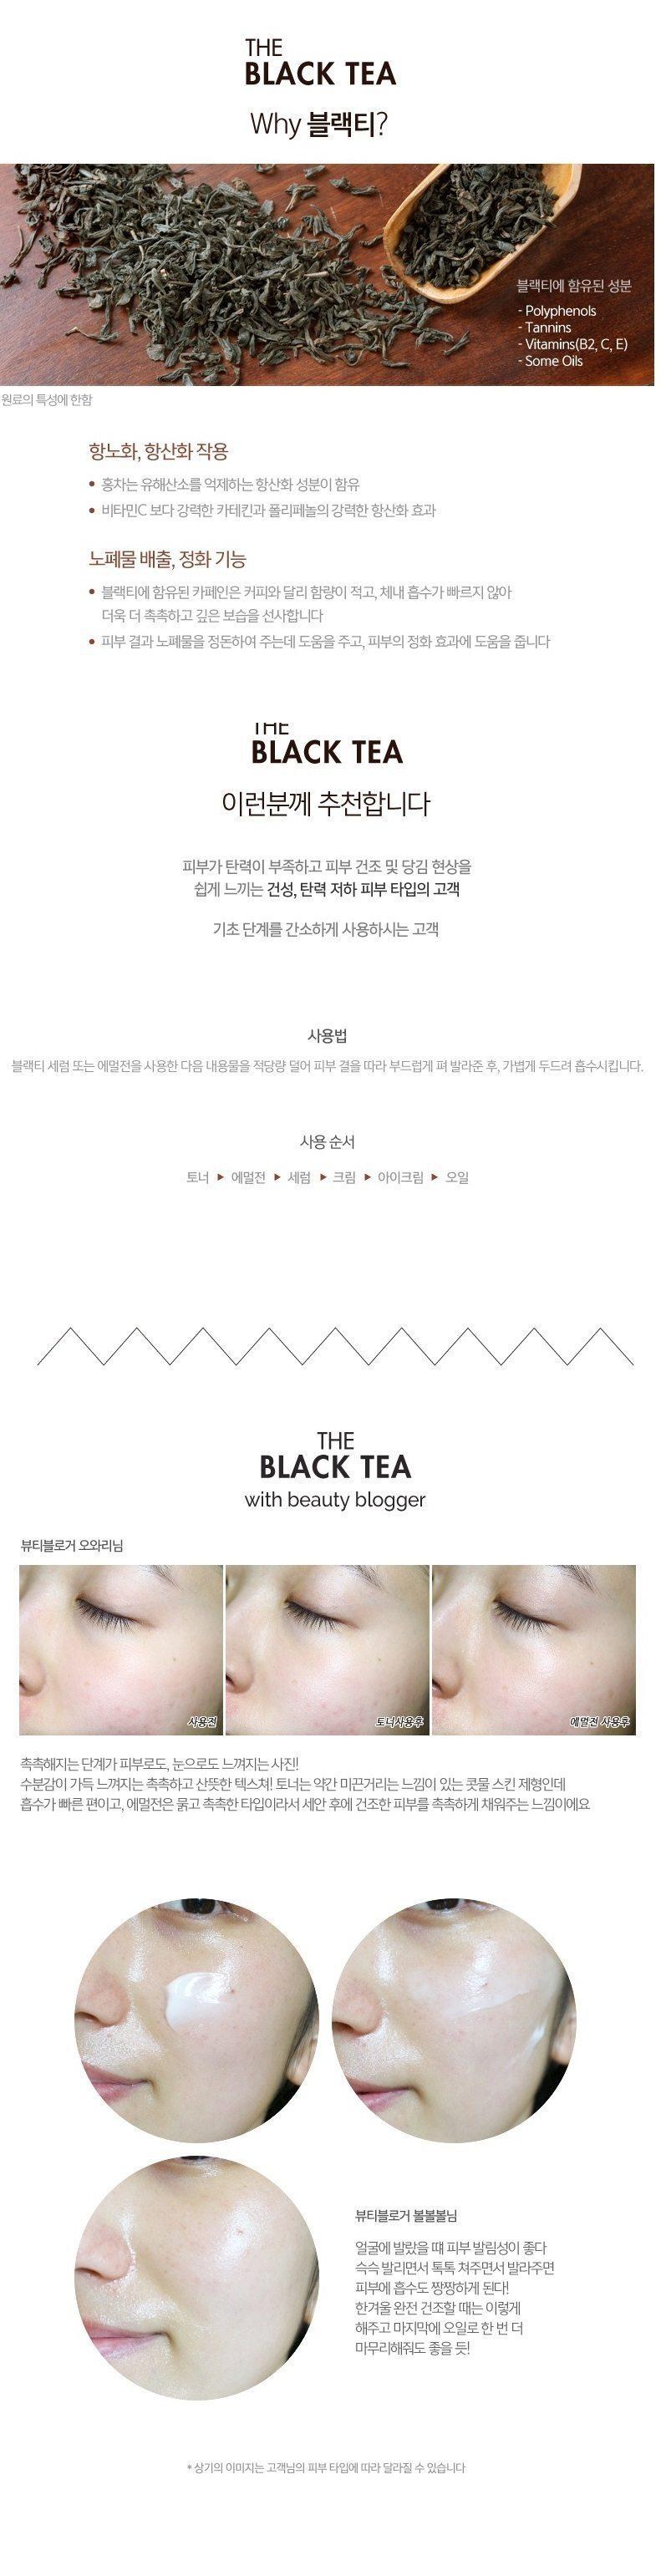 Tony Moly The Black Tea Skin Care 3 Set korean cosmetic skincare product online shop malaysia italy germany6